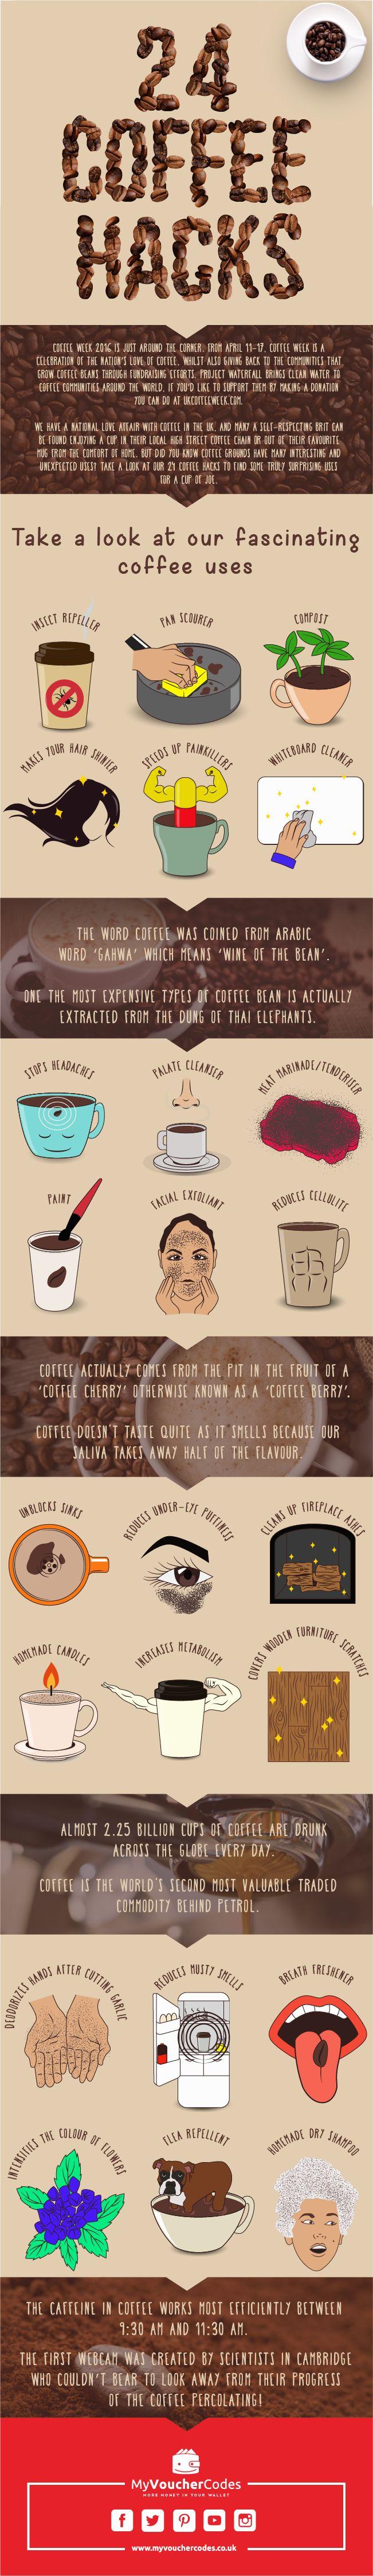 24 fantastic coffee hacks - family budgeting